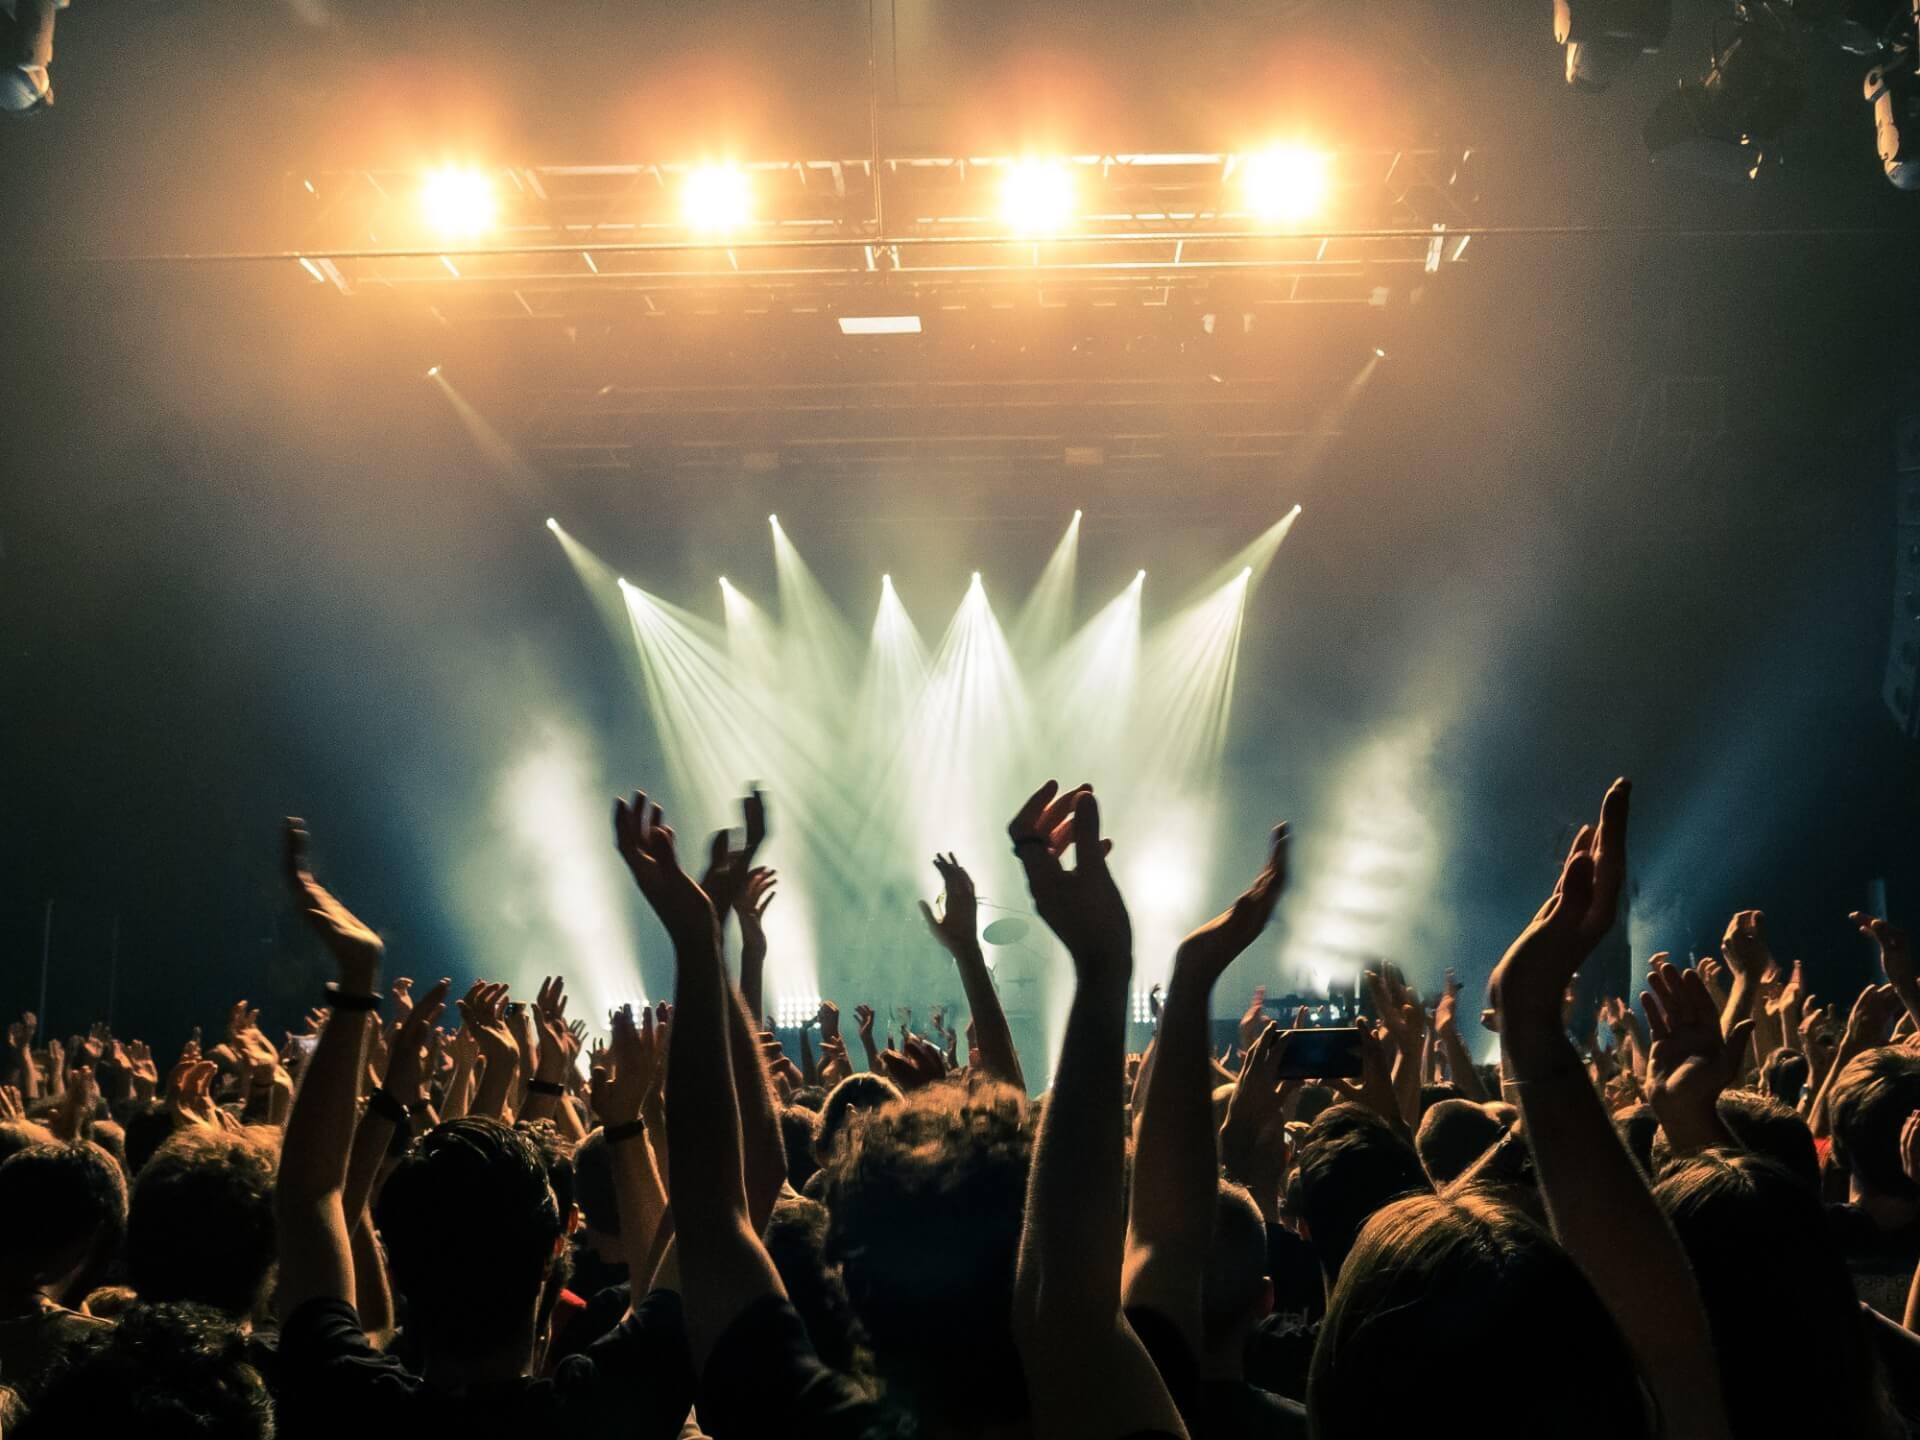 An arena show